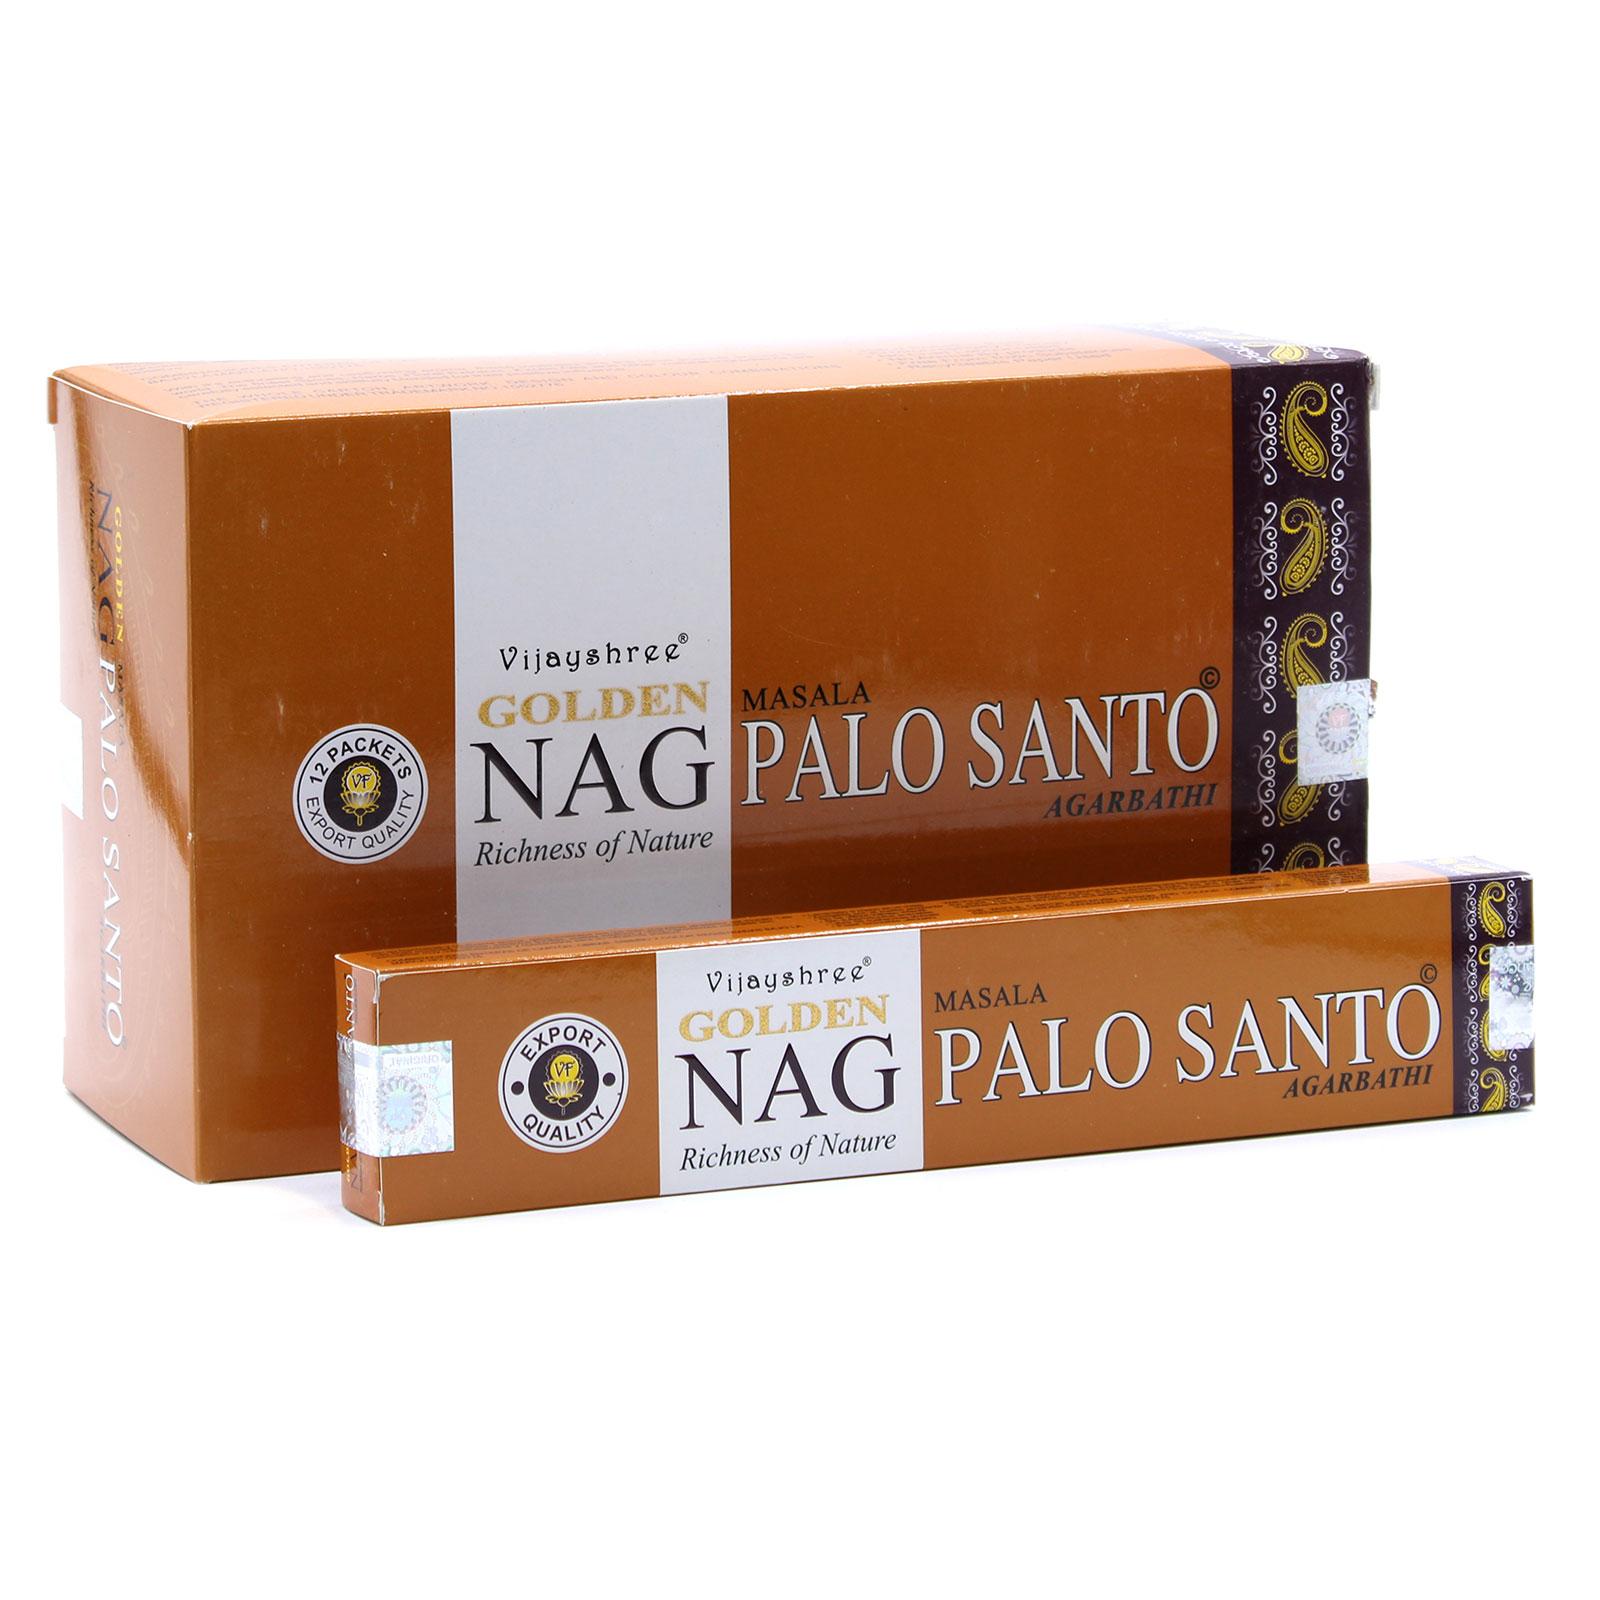 15g Golden Nag Palo Santo Incense